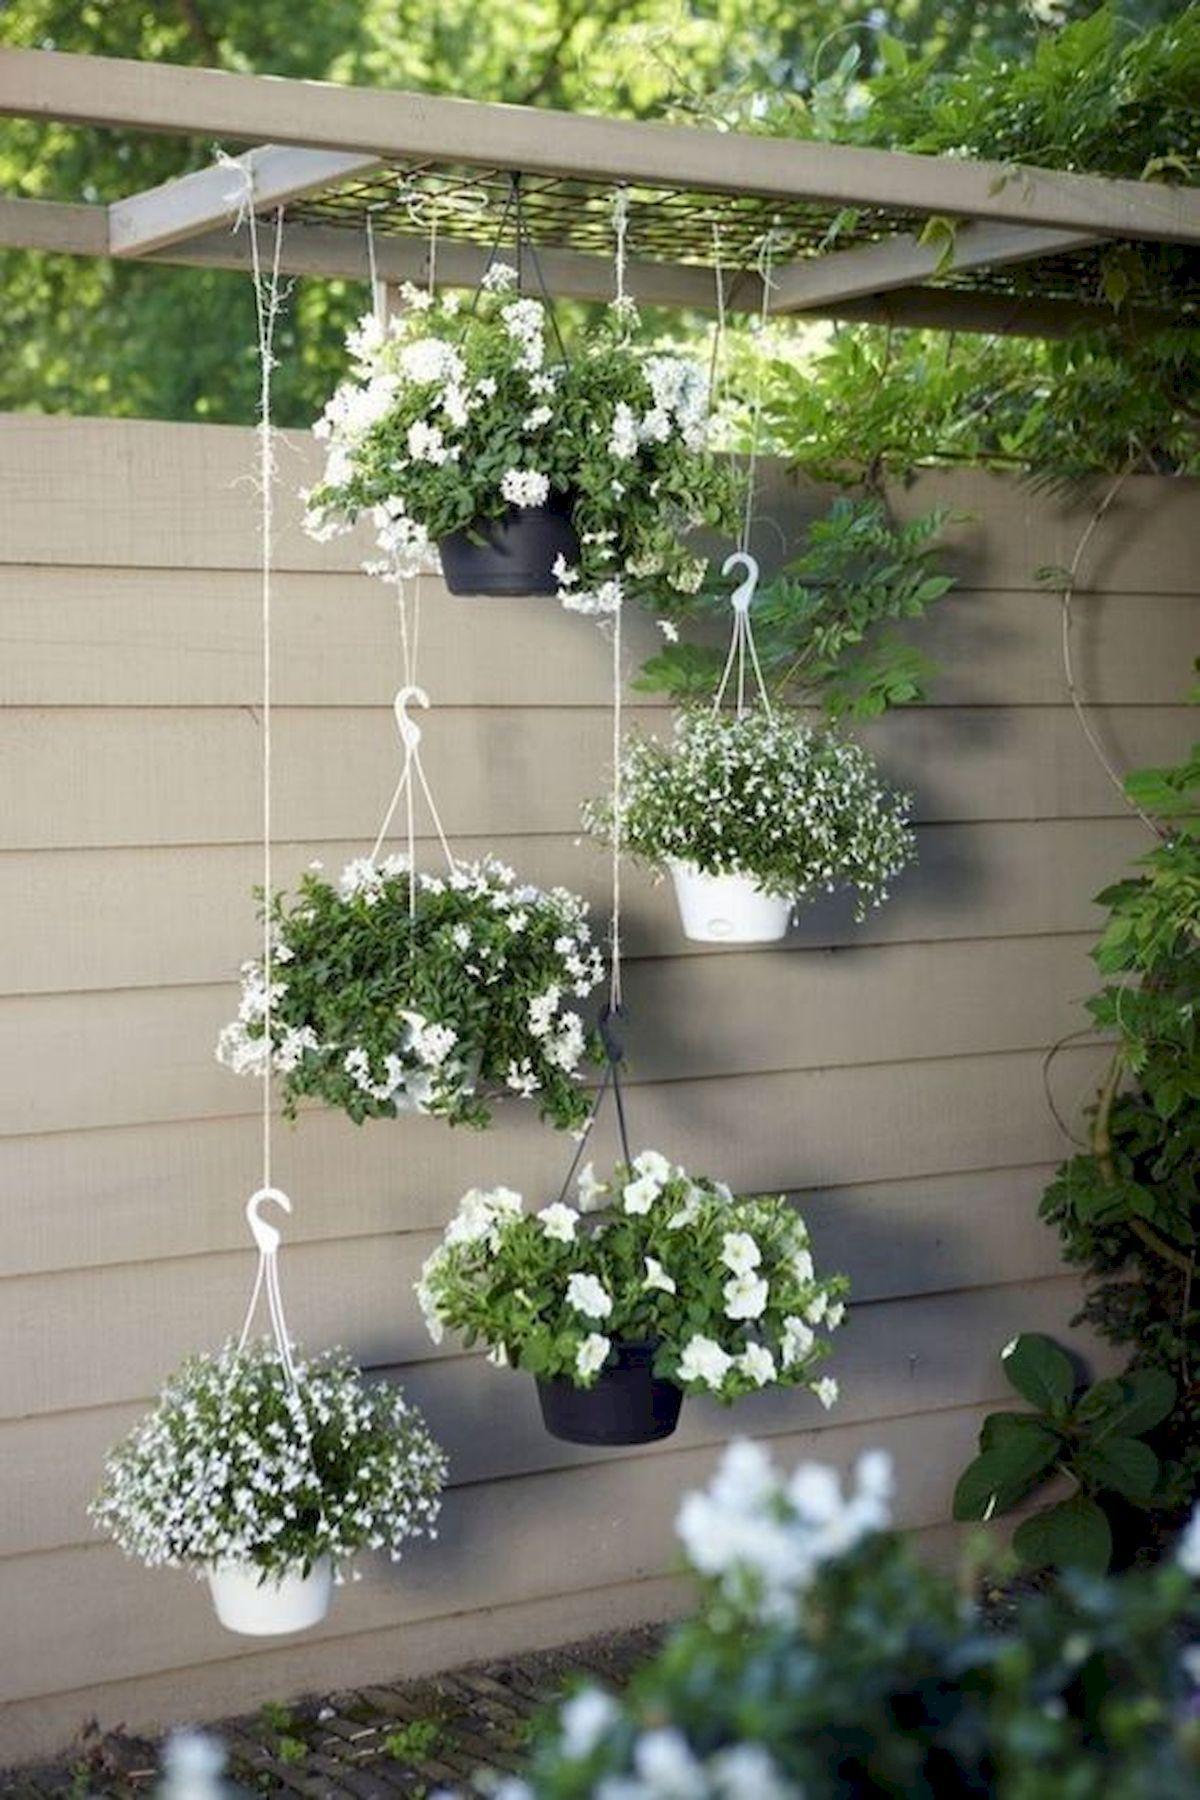 50 Awesome DIY Hanging Plants Ideas For Modern Backyard Garden